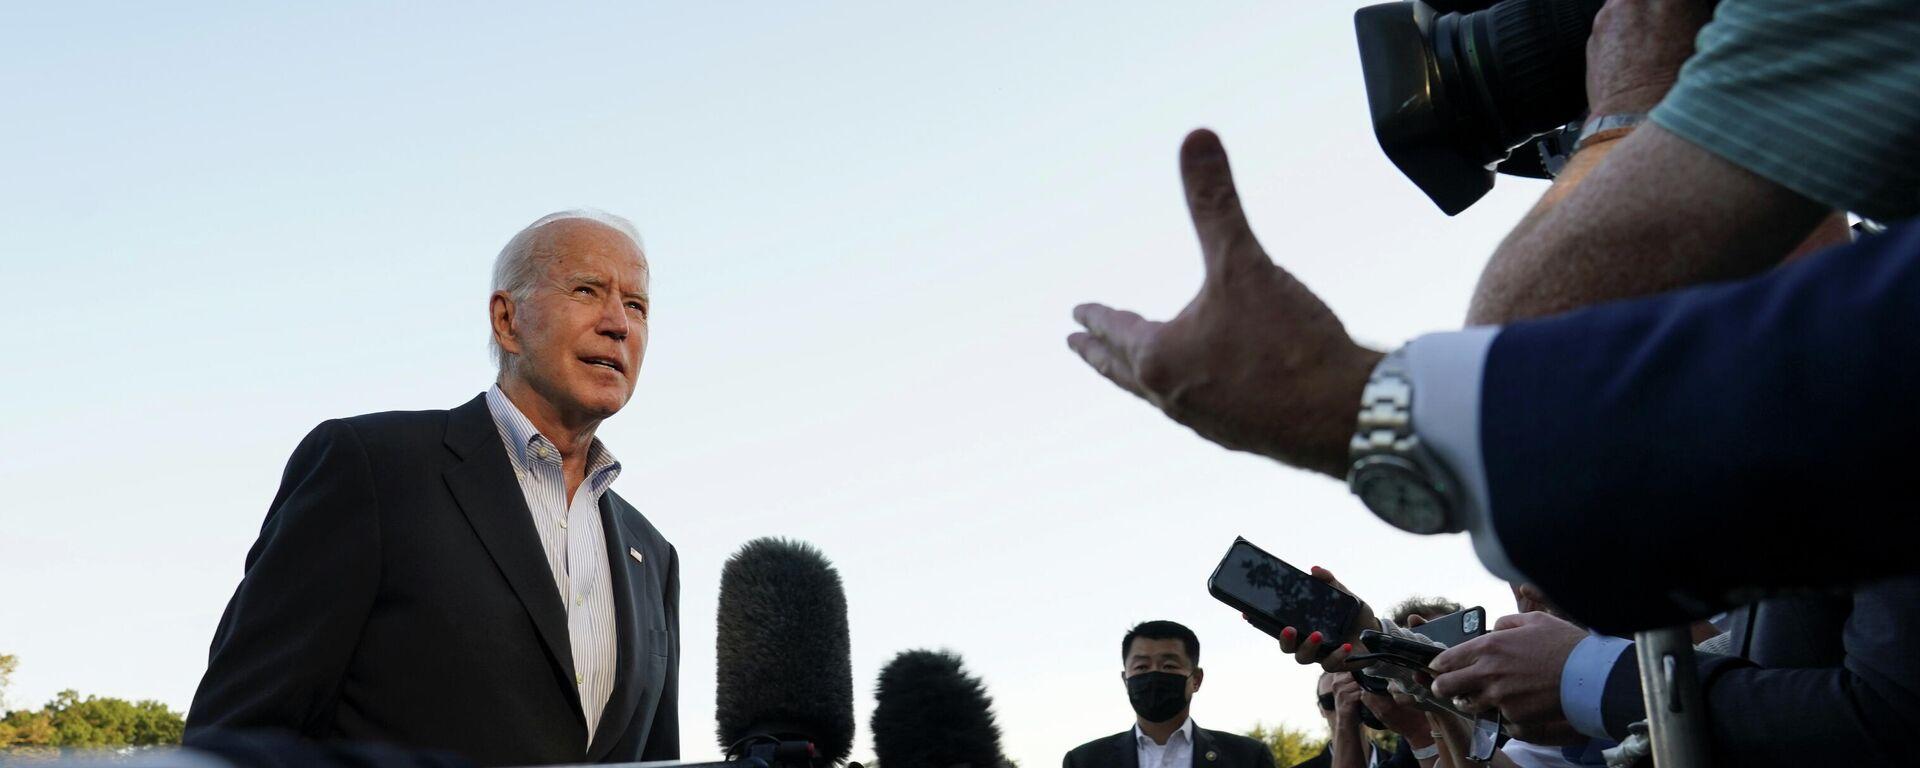 U.S. President Joe Biden speaks to reporters upon his return to the White House in Washington, U.S., September 7, 2021.  - Sputnik International, 1920, 12.09.2021